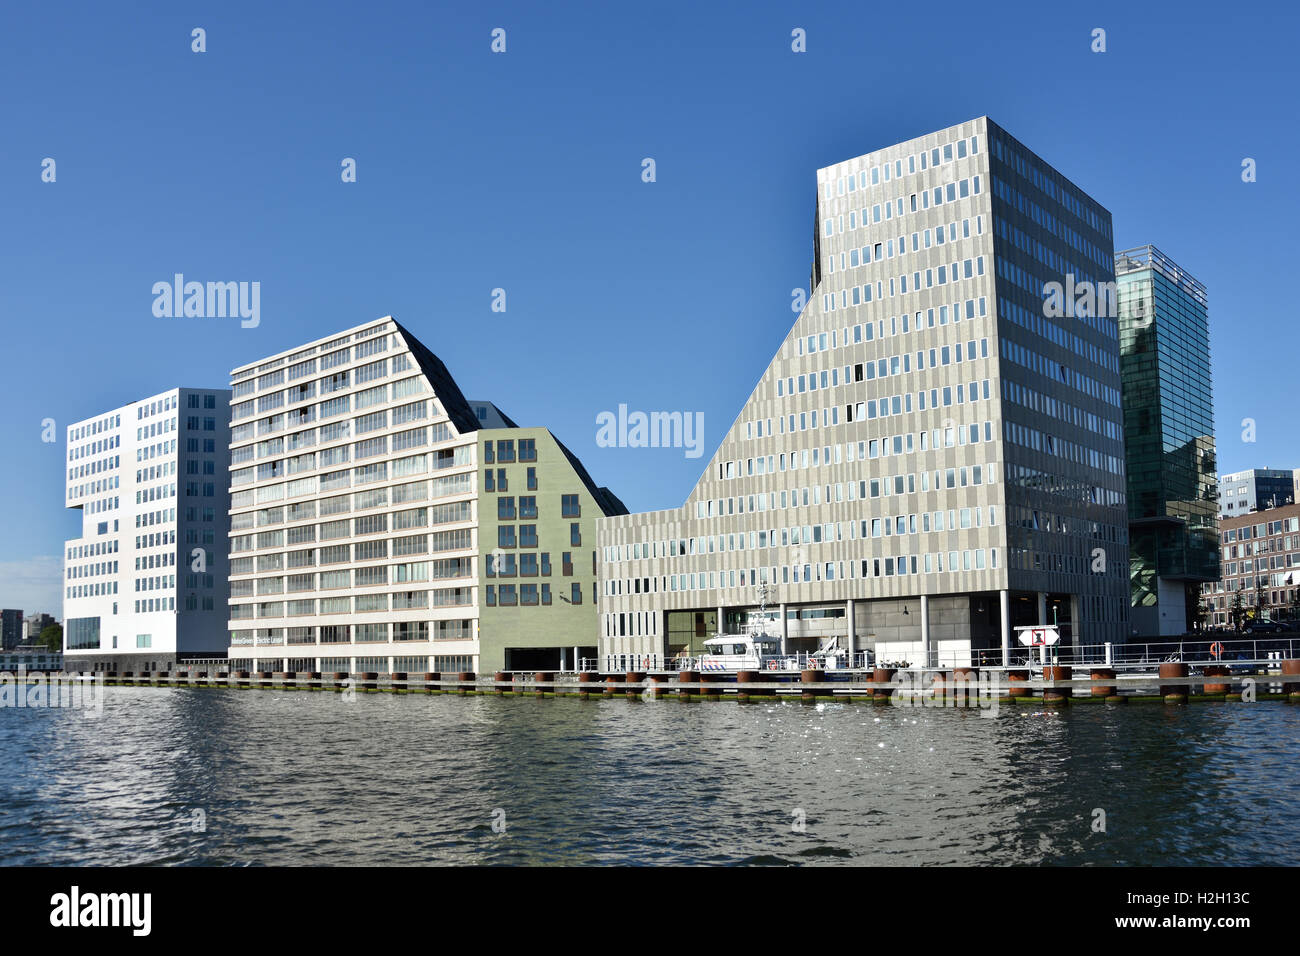 IJdok Amsterdam Netherlands Dutch modern city town - Stock Image